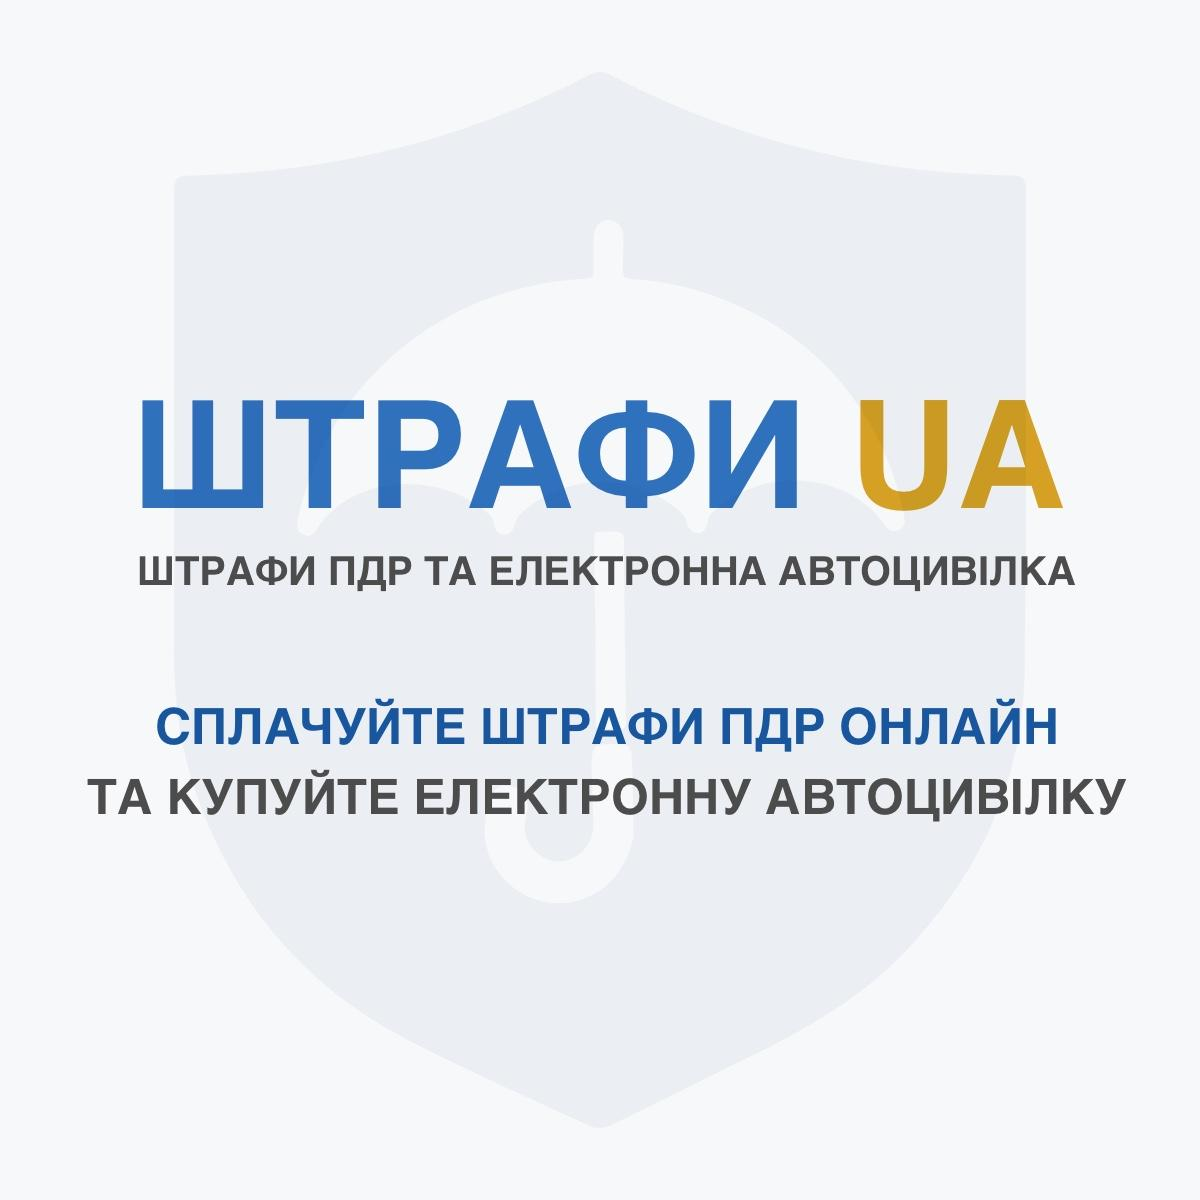 Мобільний додаток Штрафи UA / фото shtrafua.com/ru